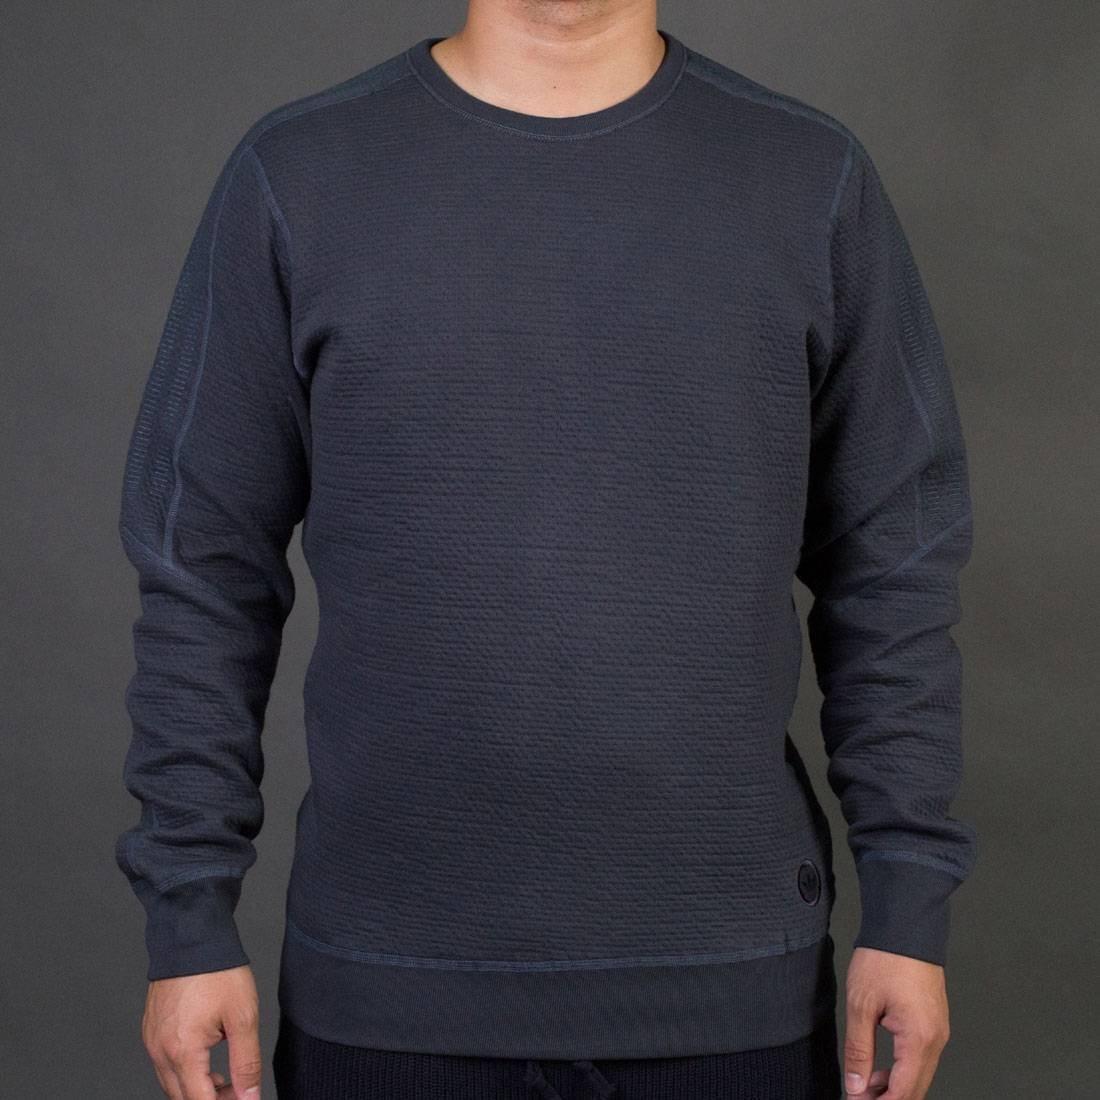 228b026b1 Adidas x Wings + Horns Men Cabin Fleece Crew Sweatshirt gray night grey